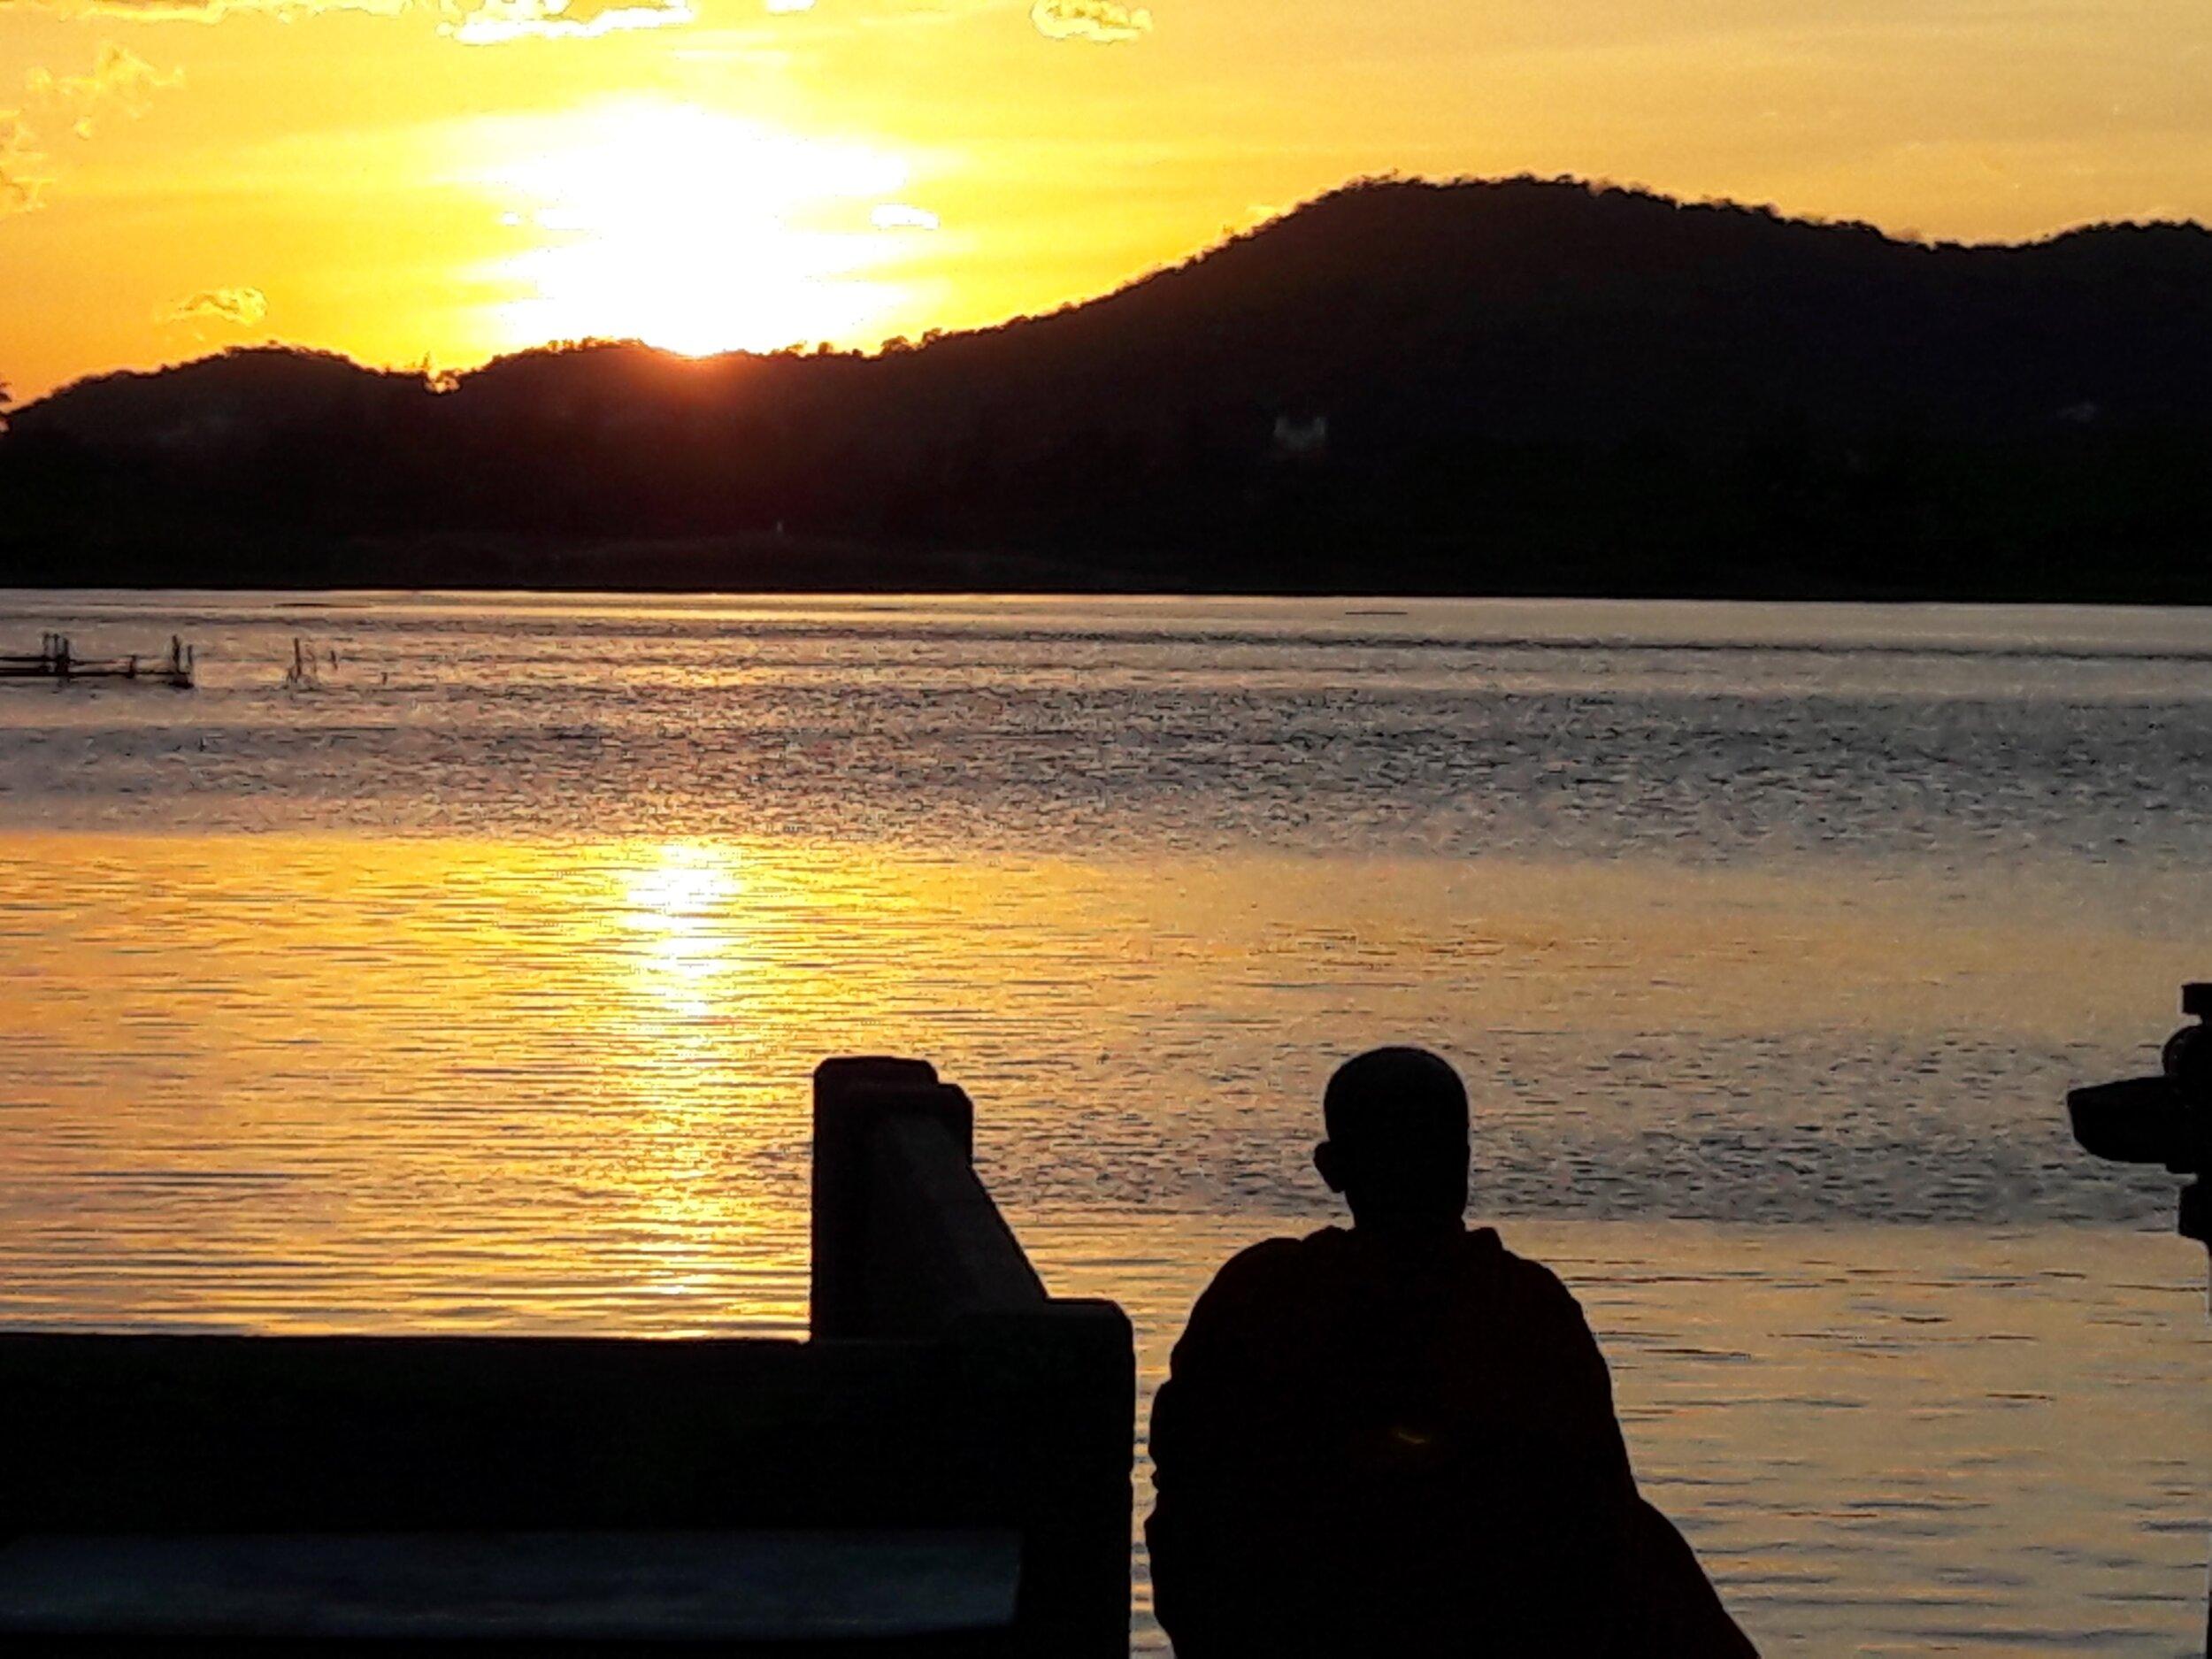 olive retreat temple meditation lake.jpg